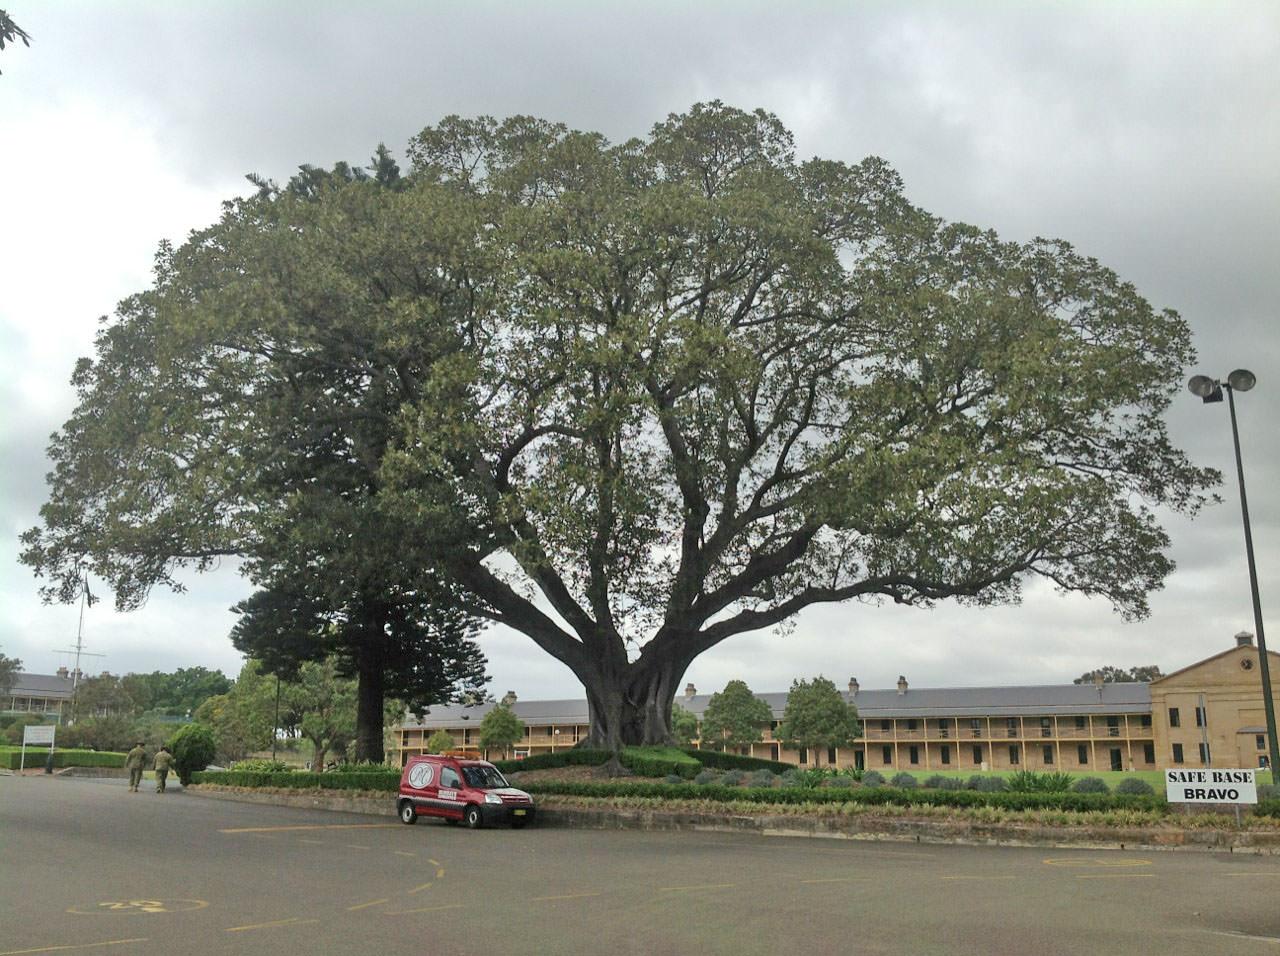 Moreton Bay Figs and Norfolk Island Pine